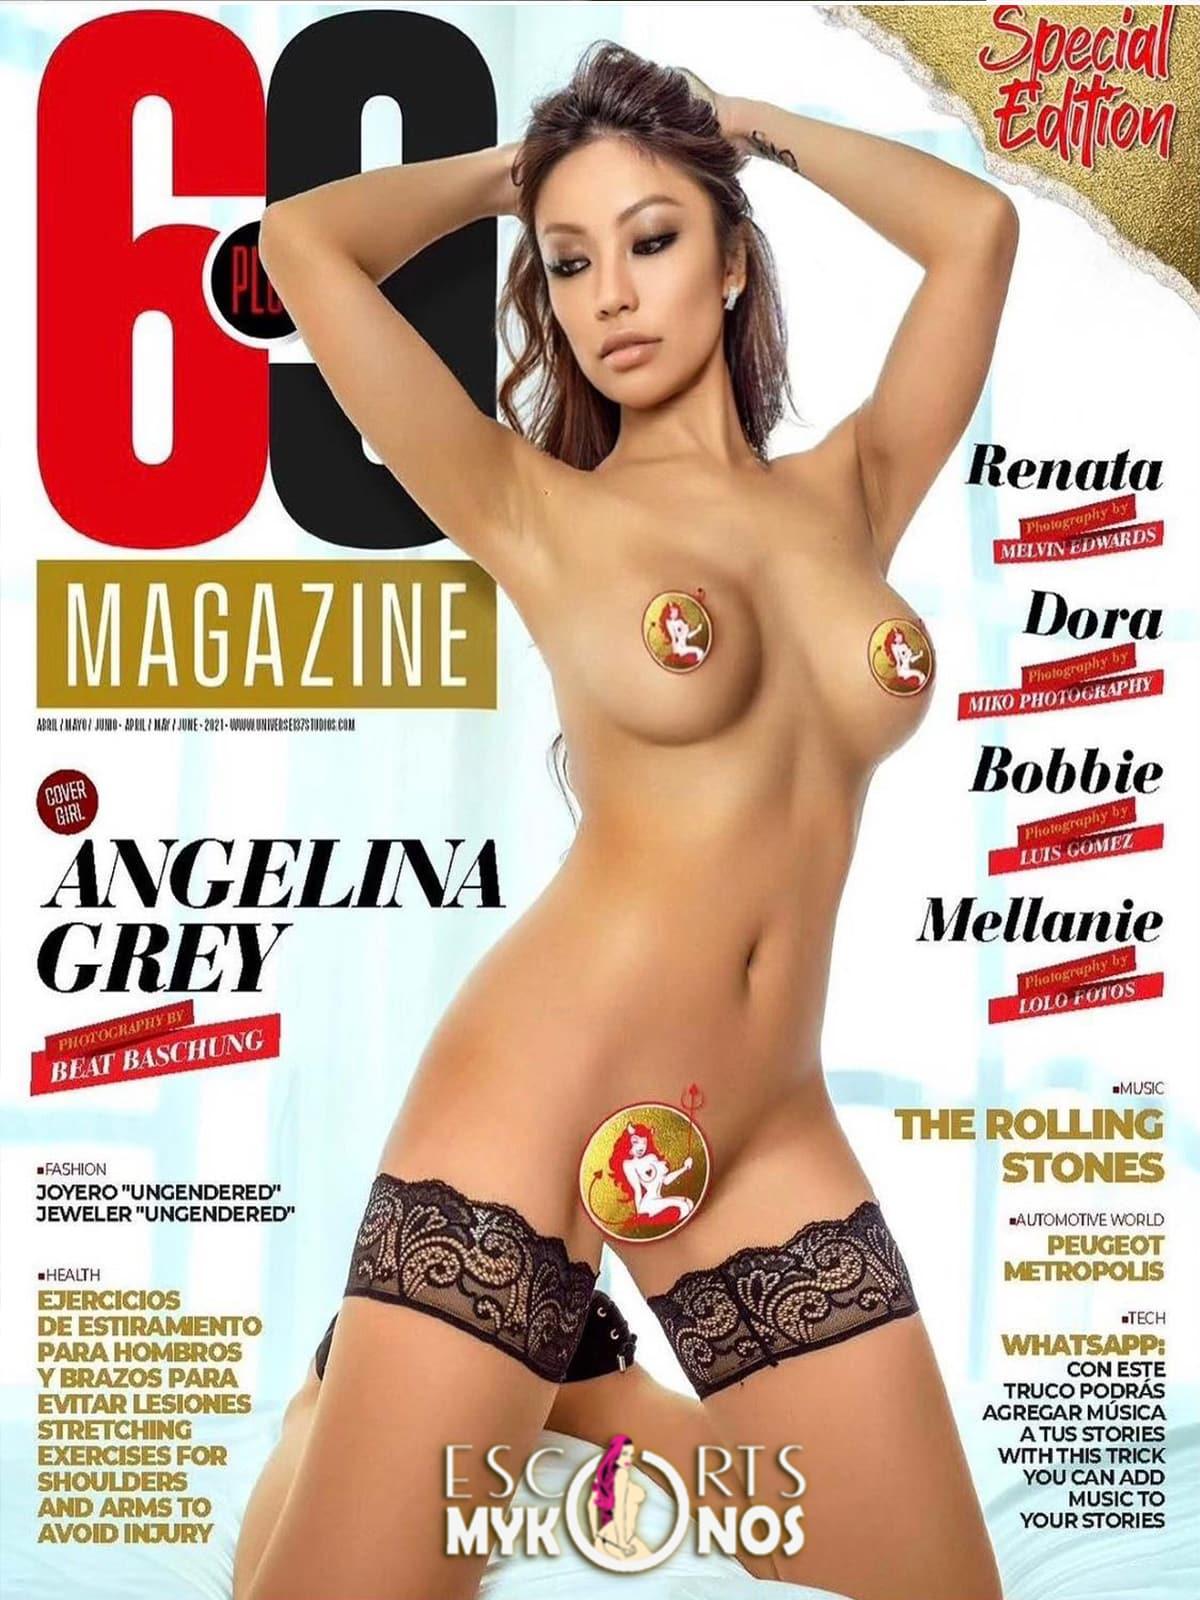 69 magazine angelina gray escort playmate